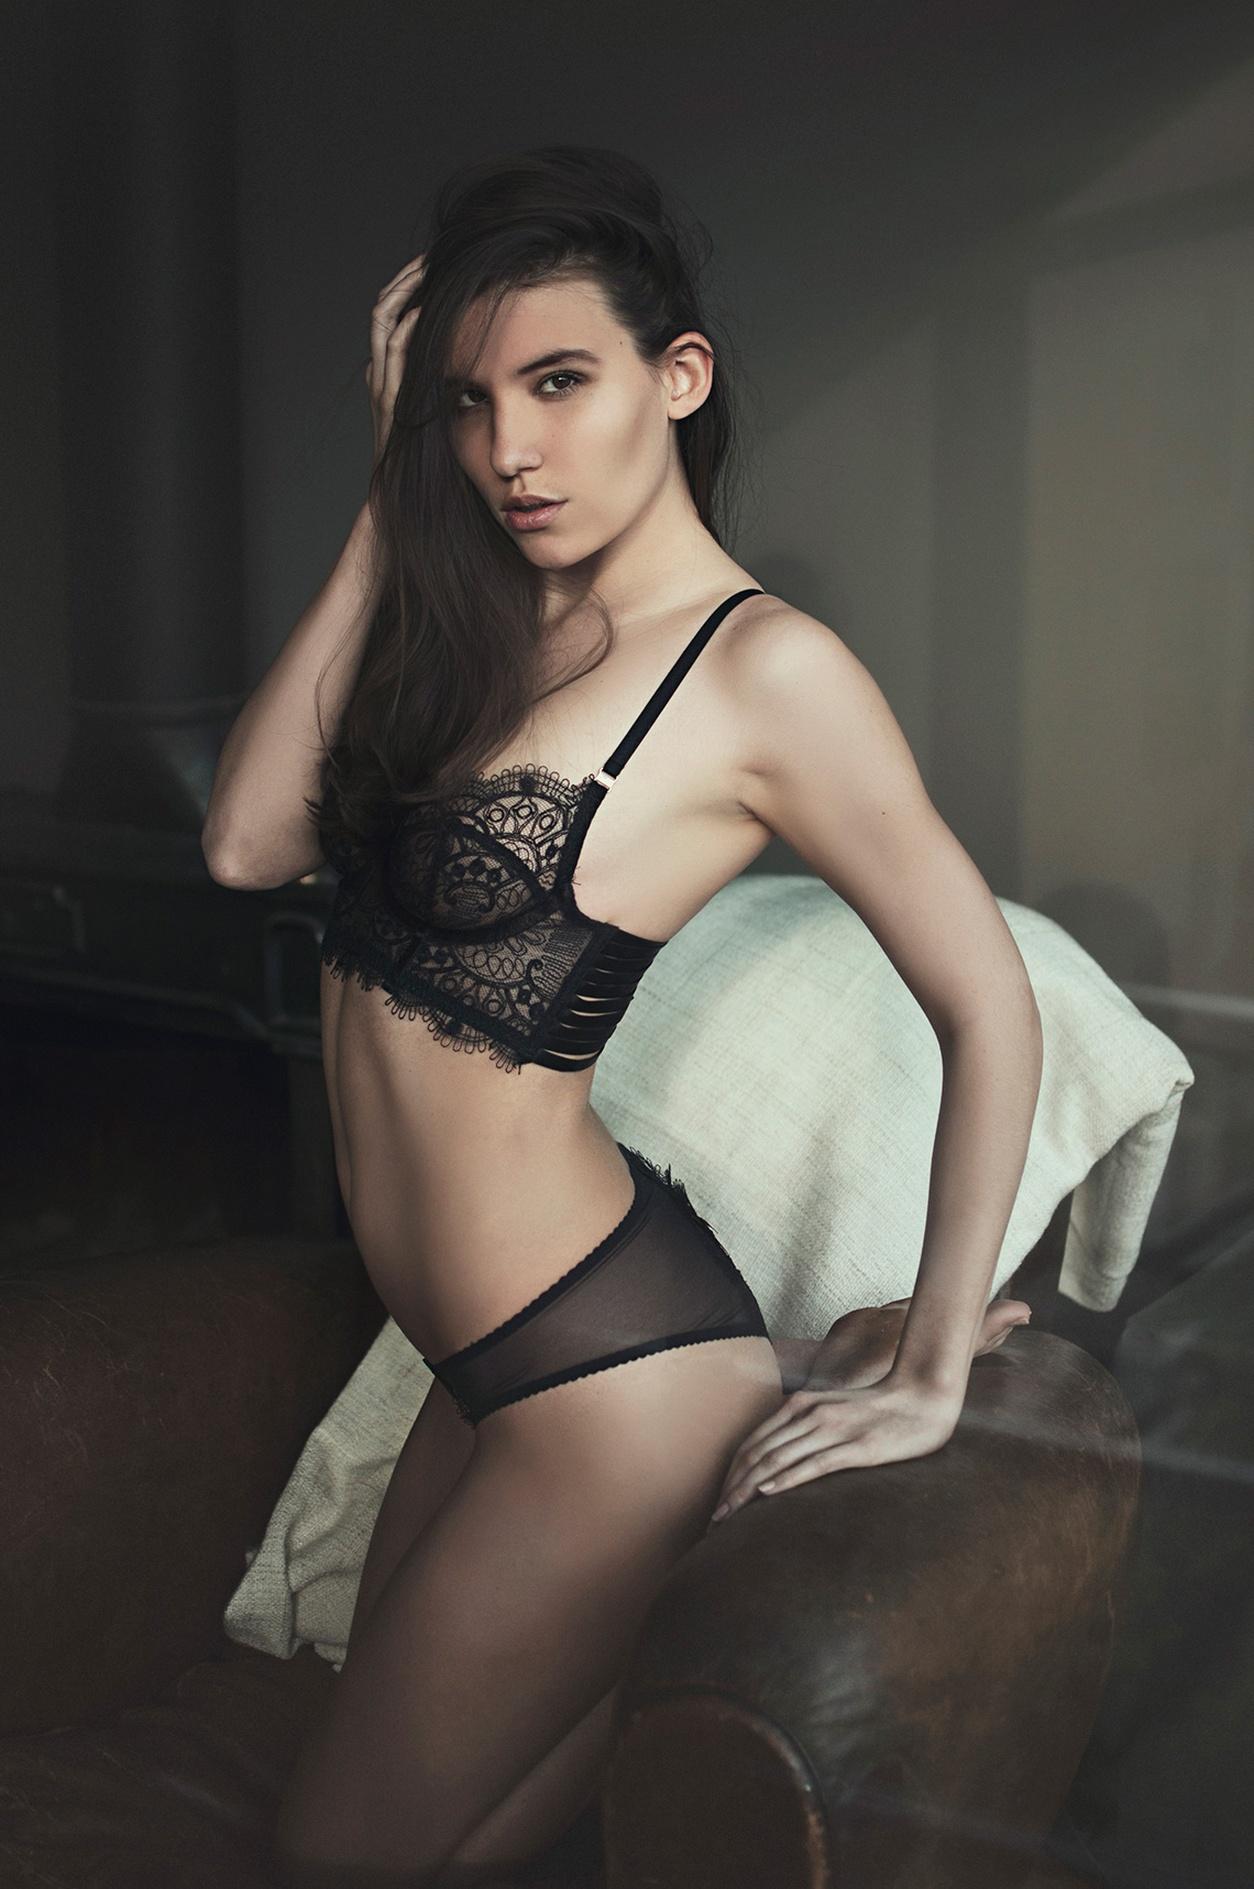 Matilde Simone